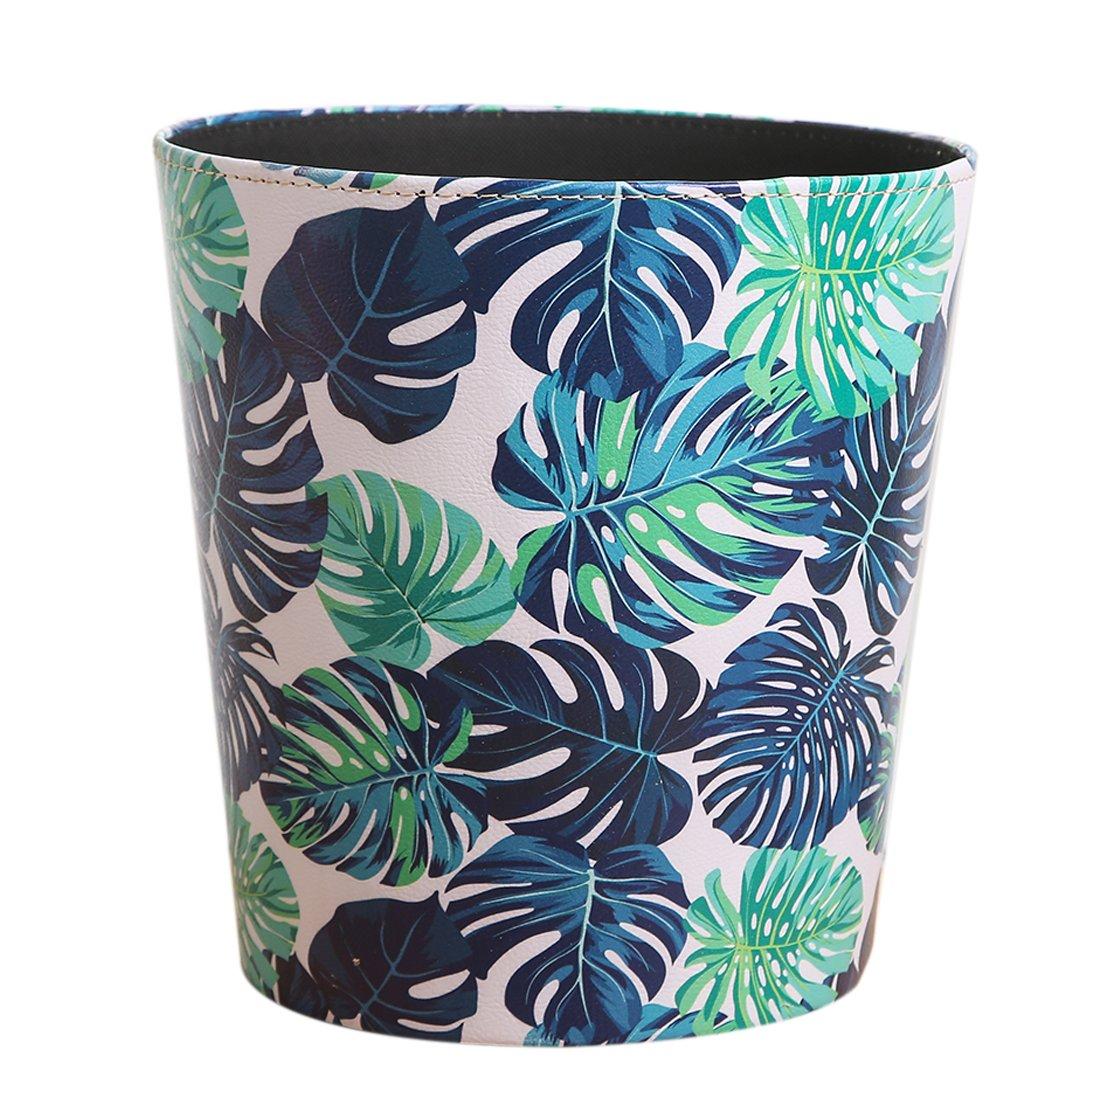 Giplar 10L Pattumiera in pelle Vintage Wastepaper Basket Pattumiera senza coperchio – 26 x 26 x 26 cm, PU, 1, 19x19x19CM